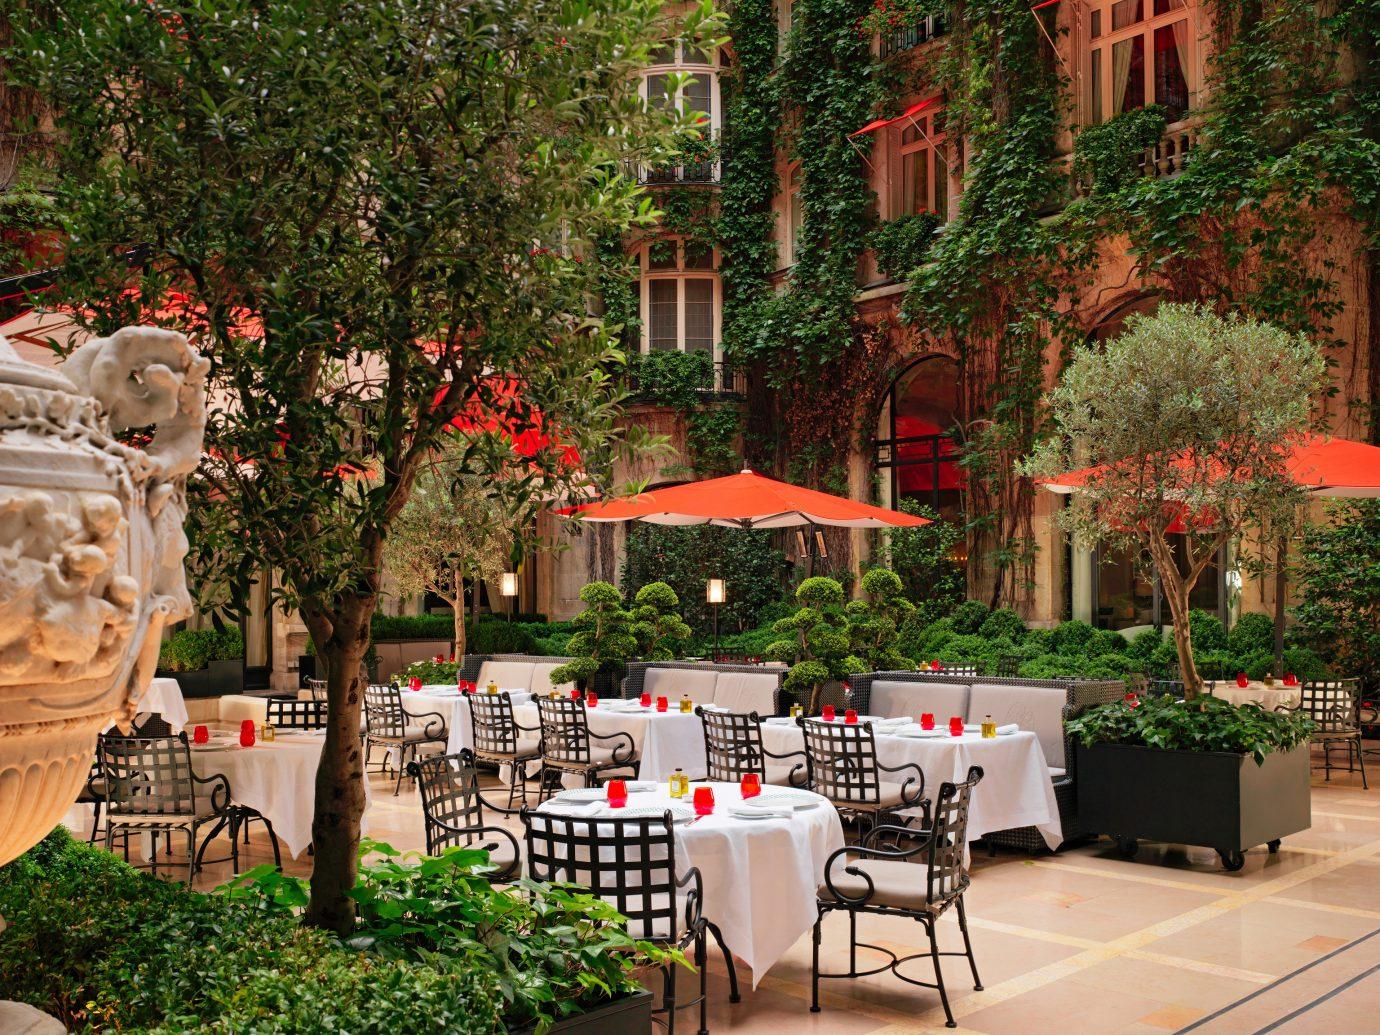 Hotels Luxury Travel tree outdoor floristry Courtyard Garden flower restaurant backyard plaza